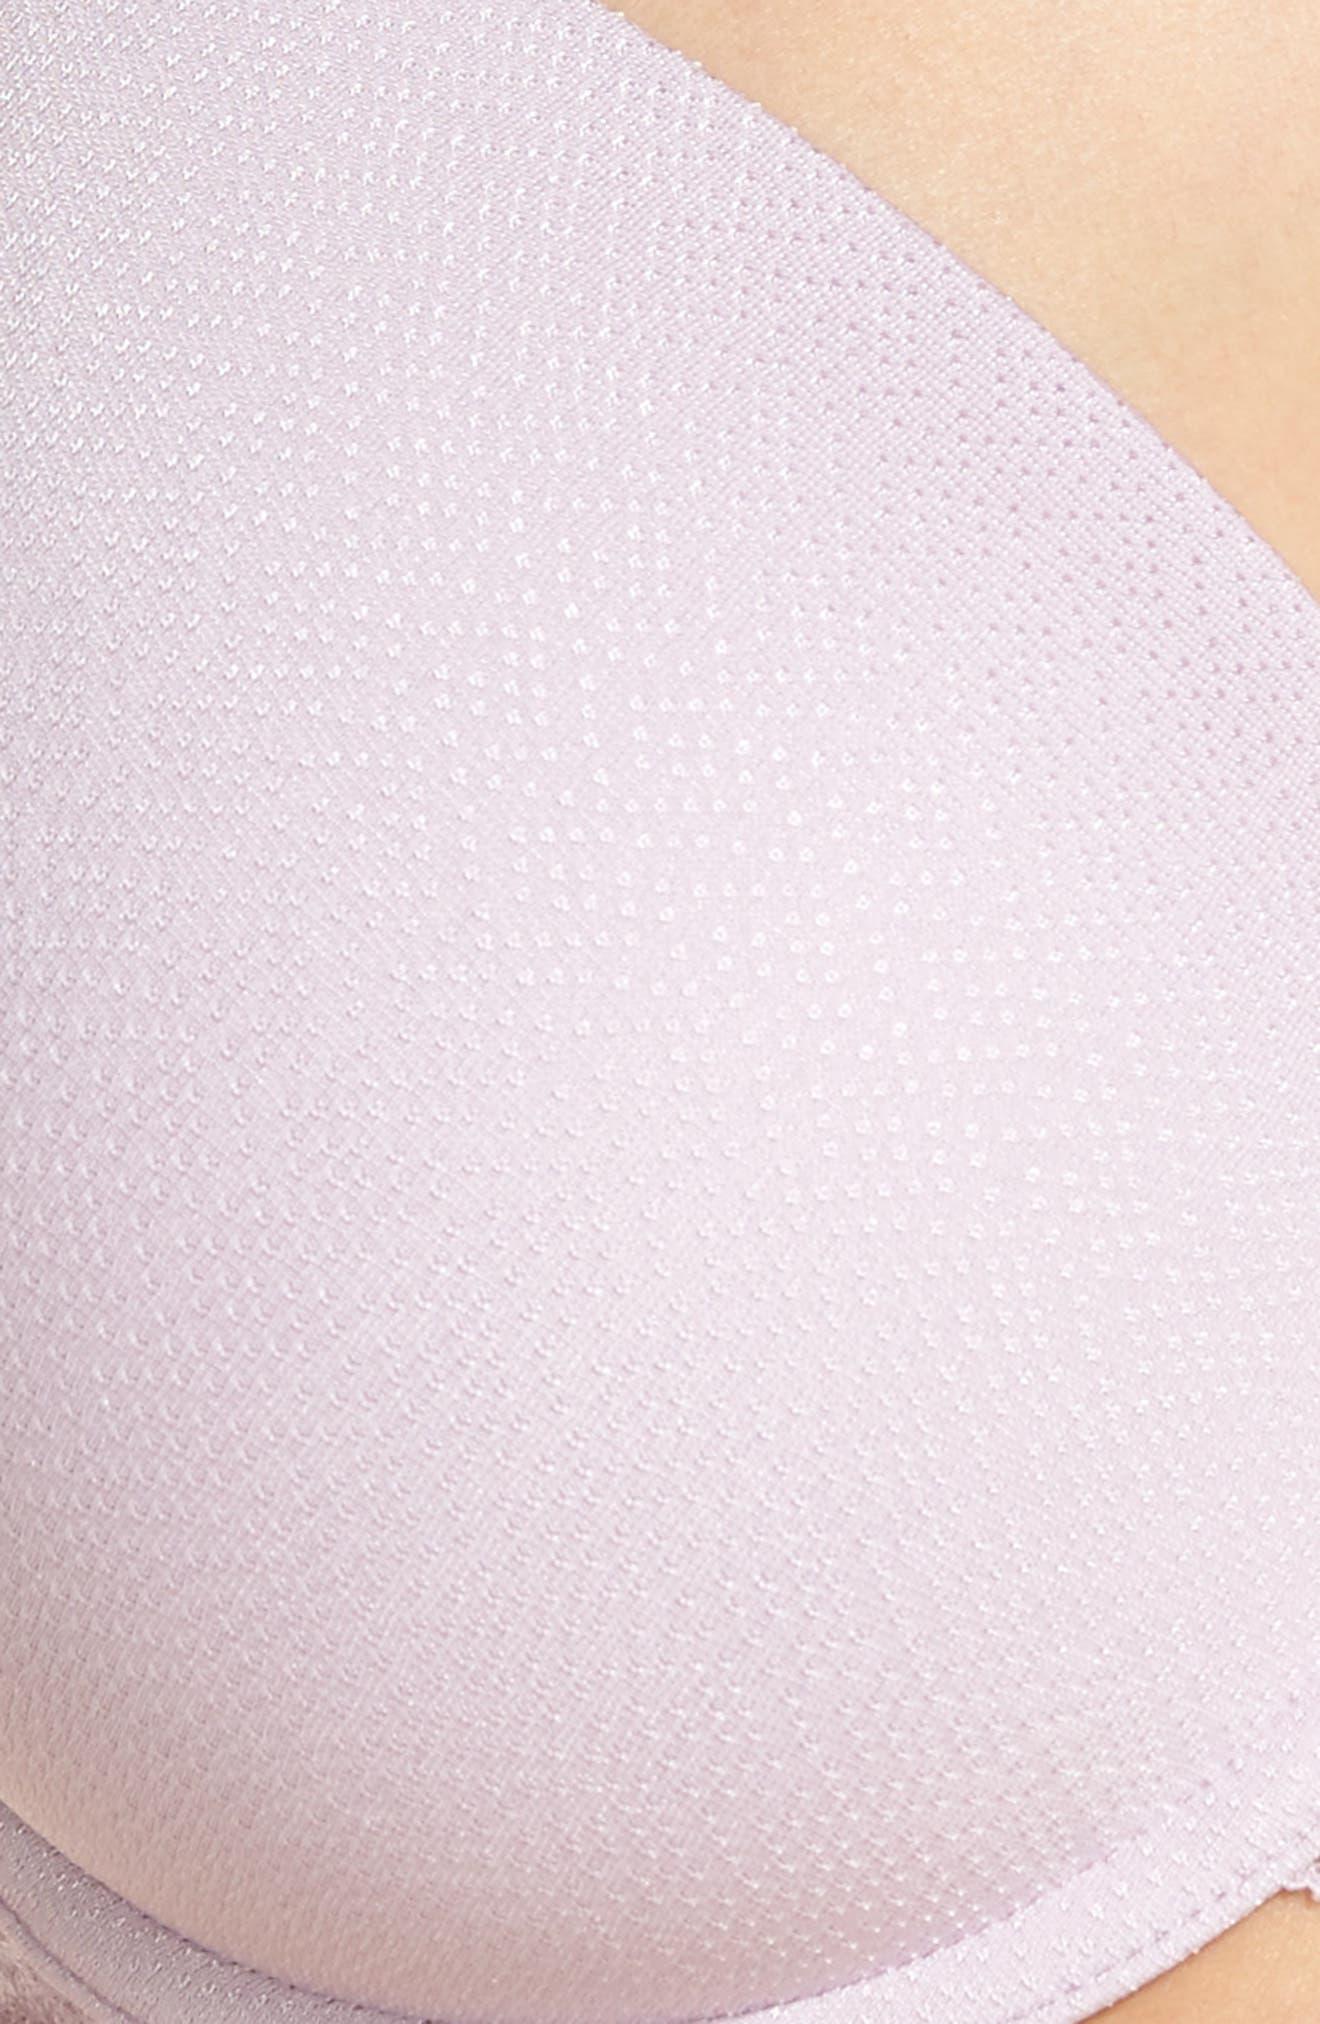 Top Tier Underwire T-Shirt Bra,                             Alternate thumbnail 10, color,                             Lavender Frost